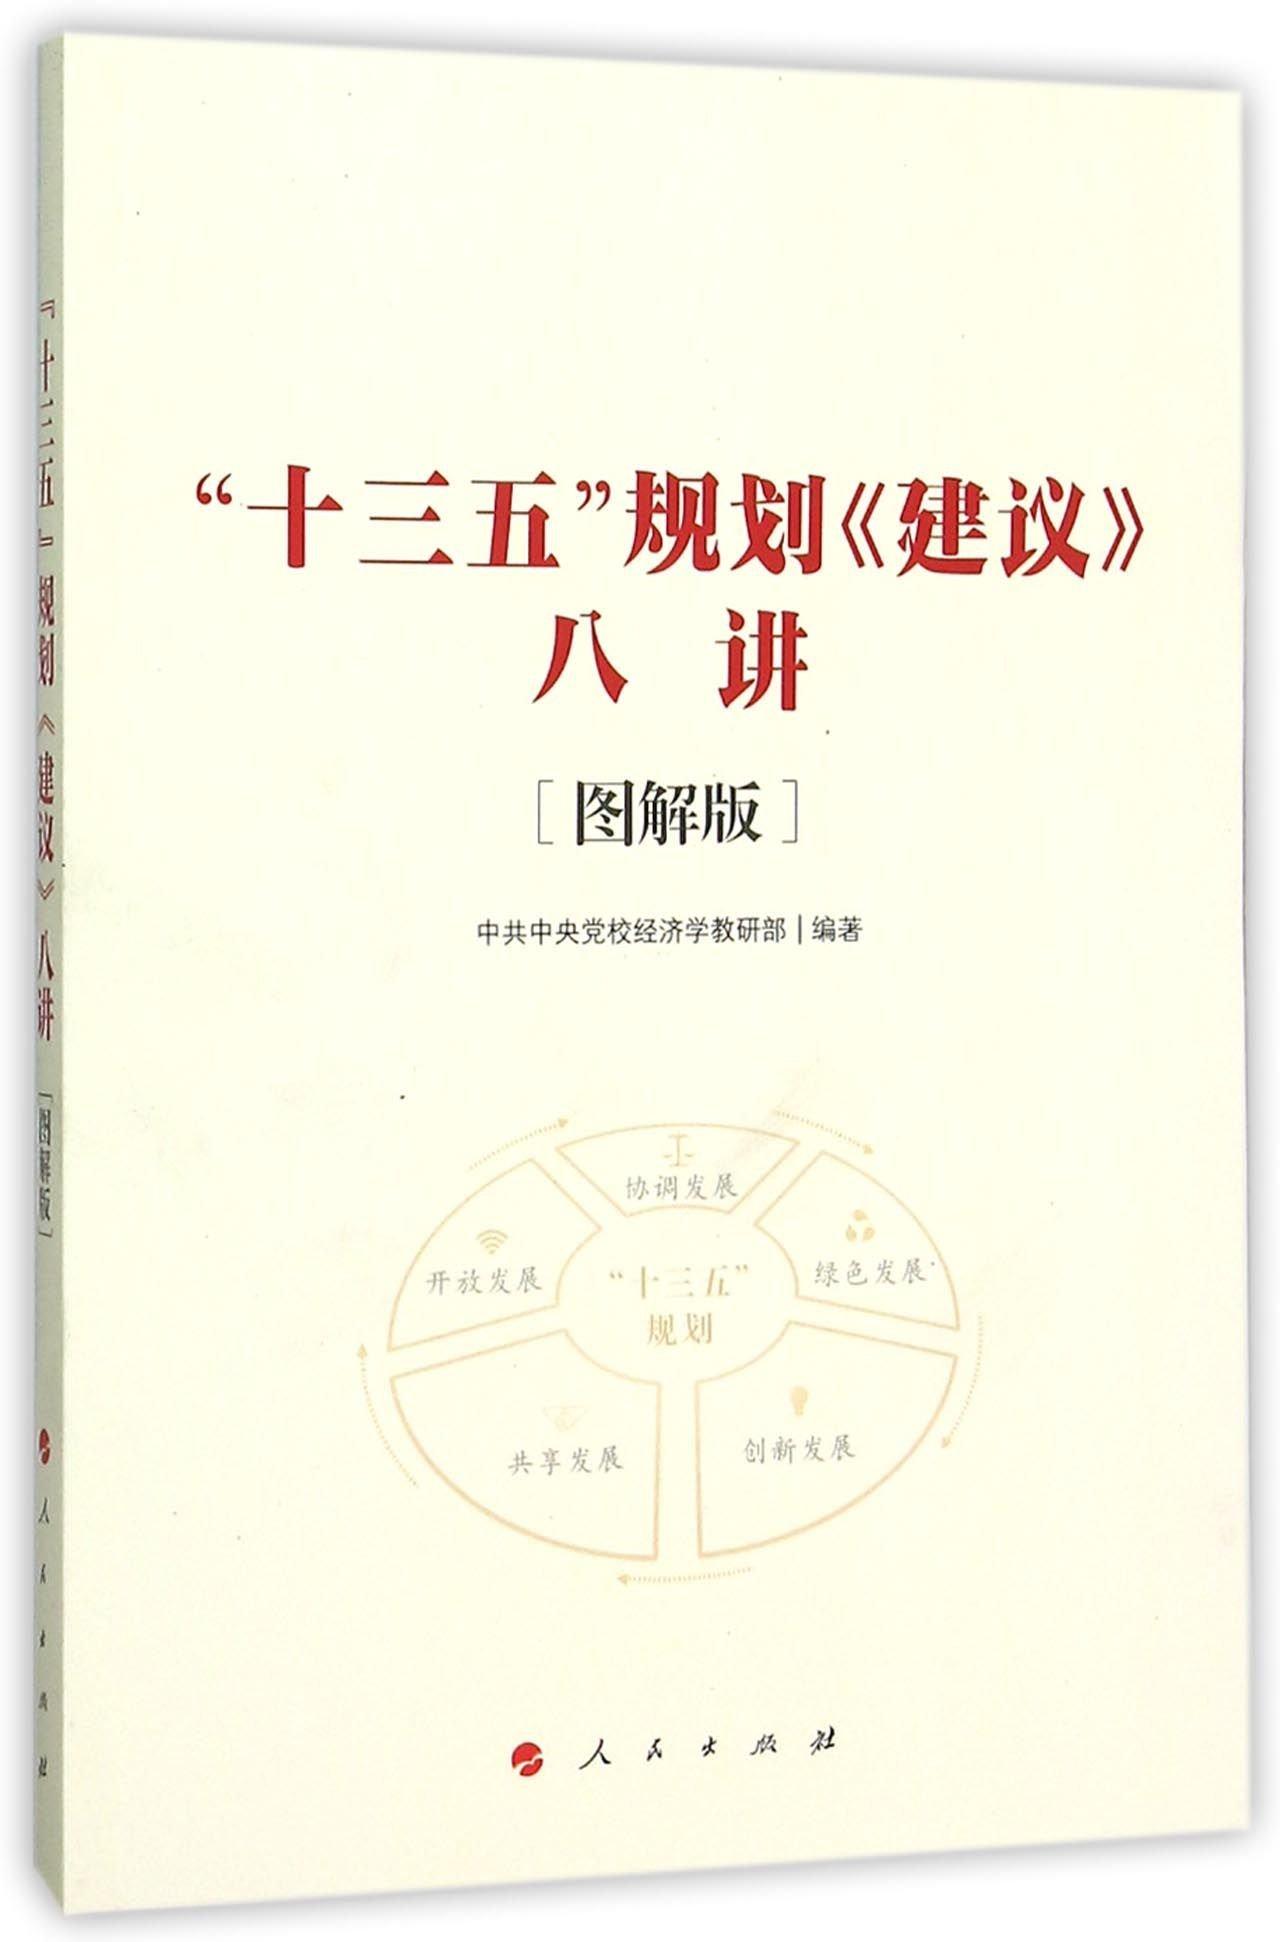 Read Online 十三五规划建议八讲(图解版) pdf